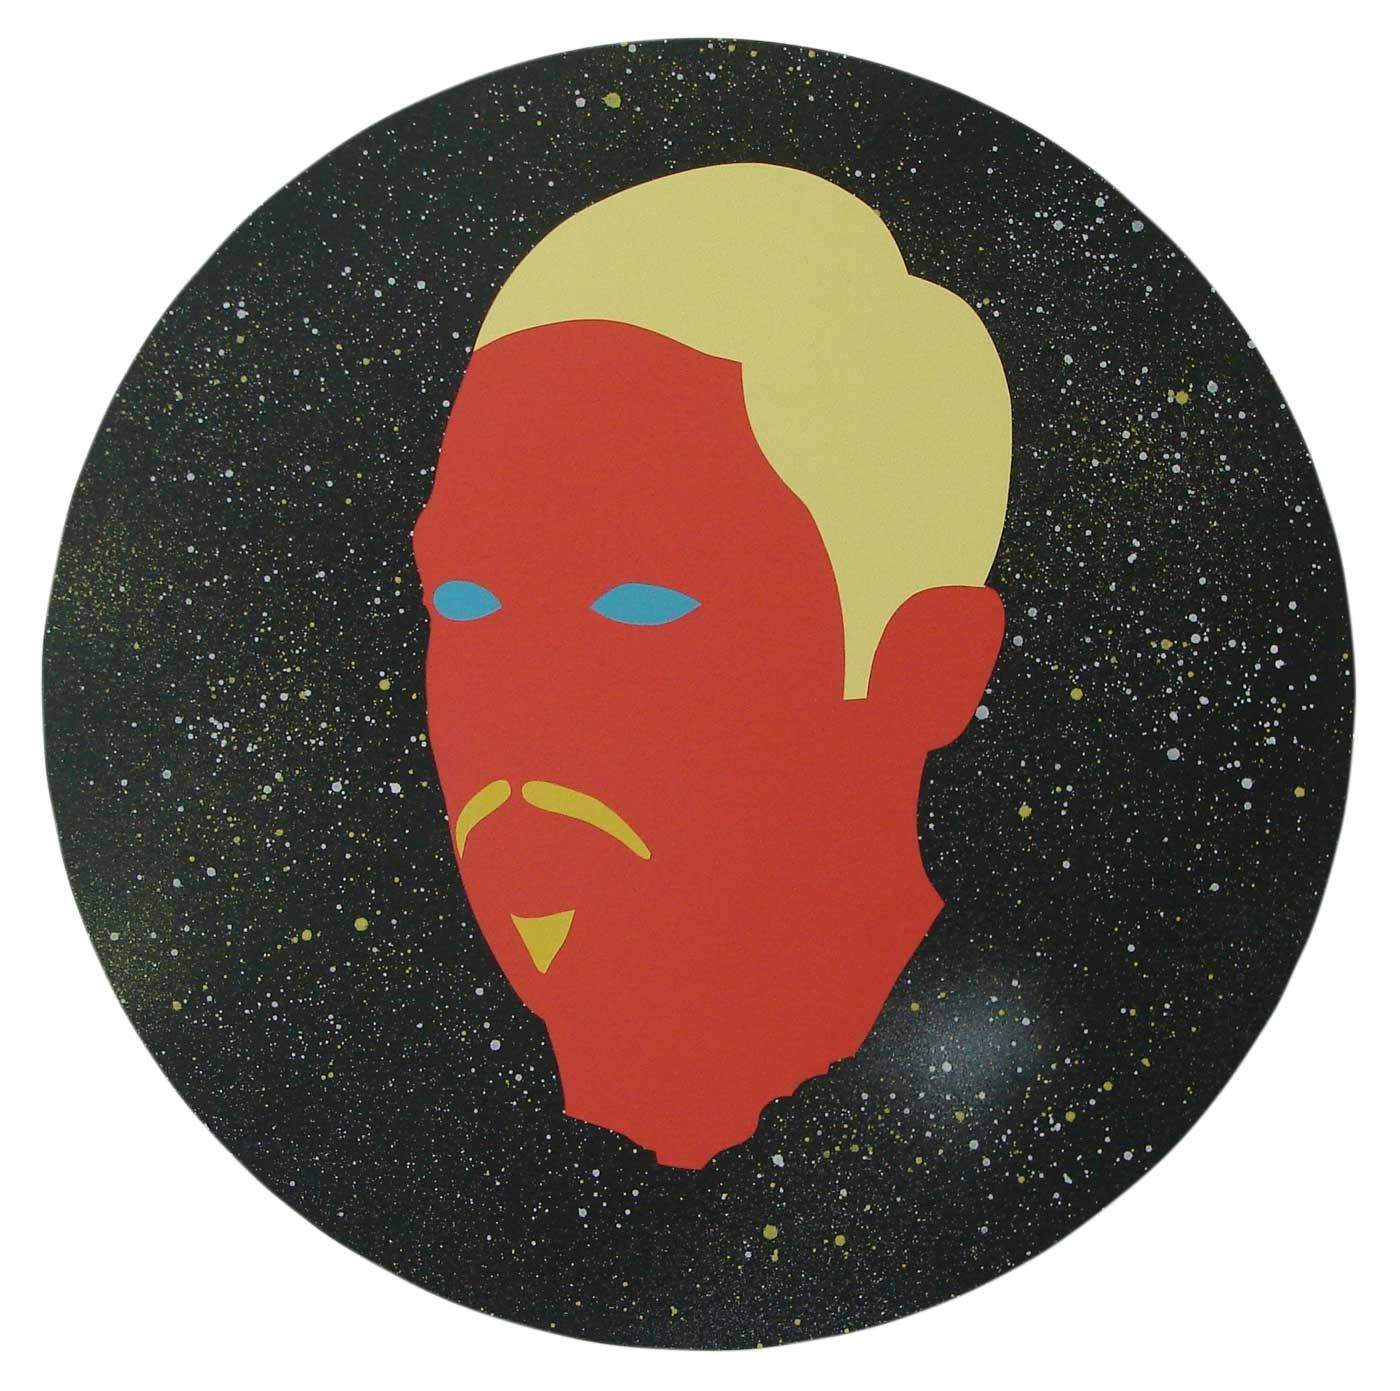 Wayne Youle  Every 18 years a sighting , 2014 Acrylic and enamel on board 437mm, diameter (unframed), 560 mm, diameter (framed)  _______